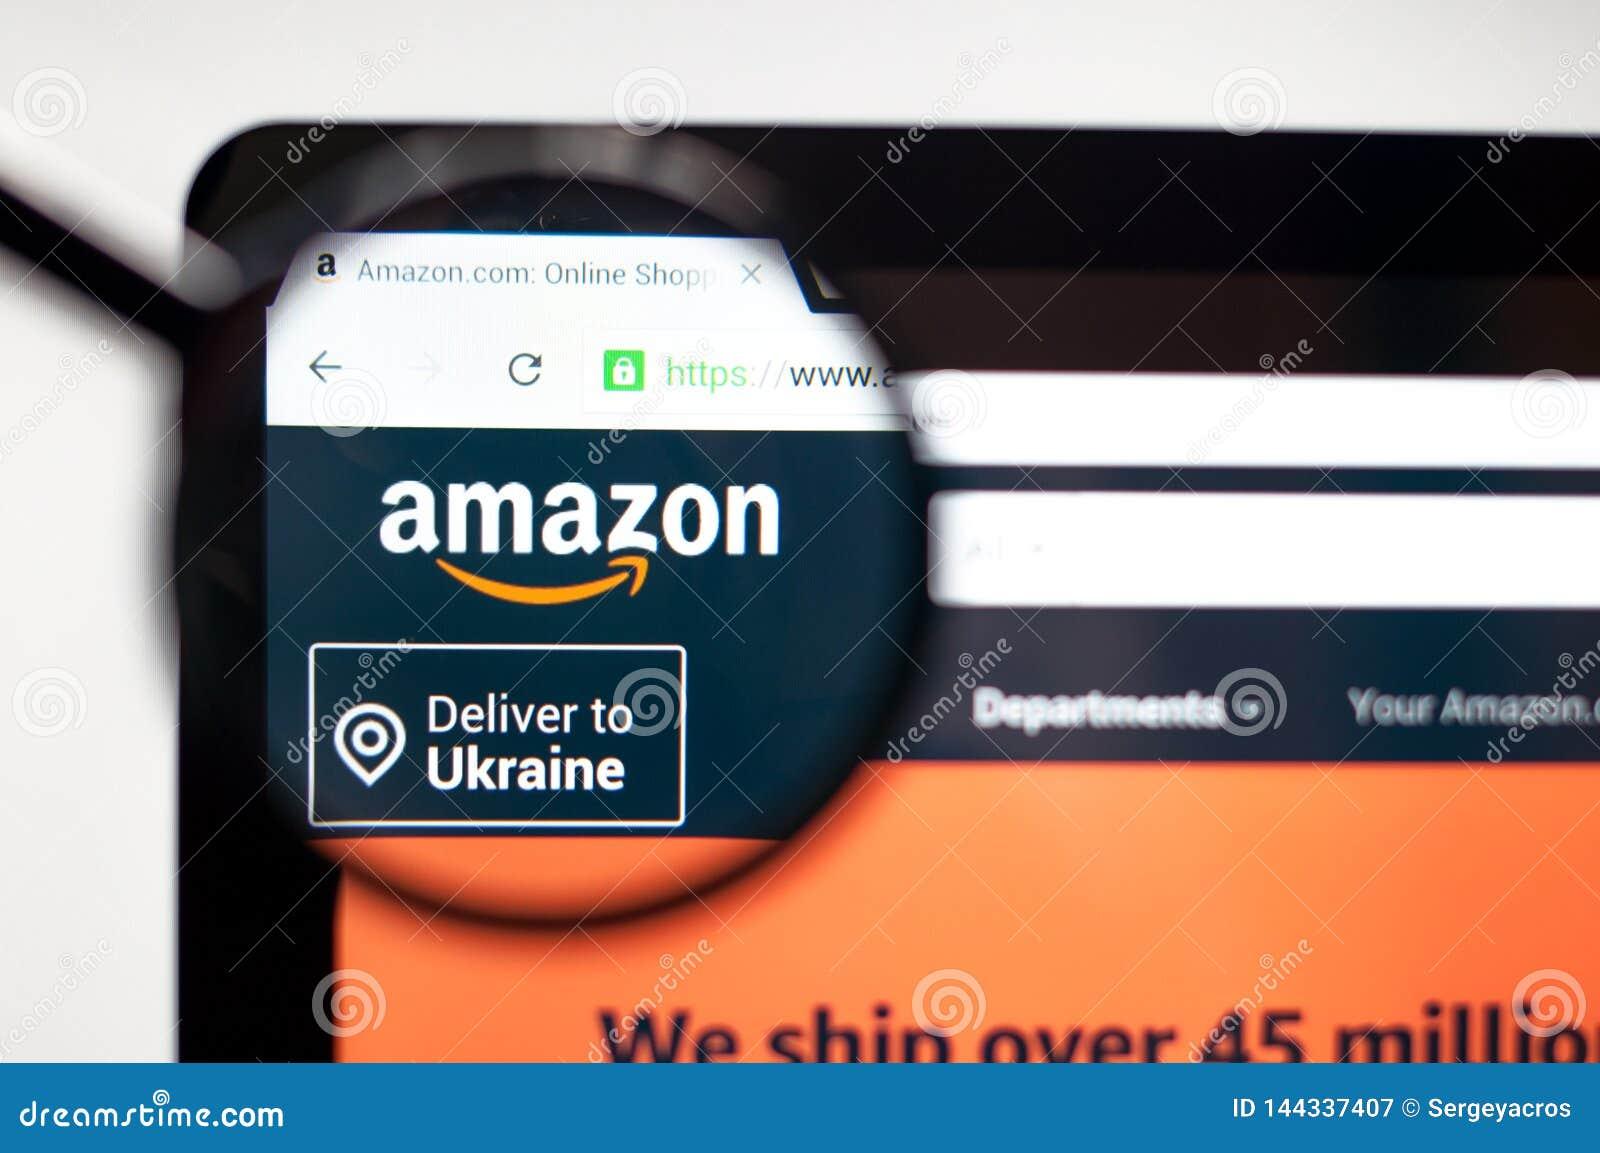 Kiev, Ukraine - april 5, 2019: Amazon website homepage. It is an American electronic commerce and cloud computing company. Amazon.